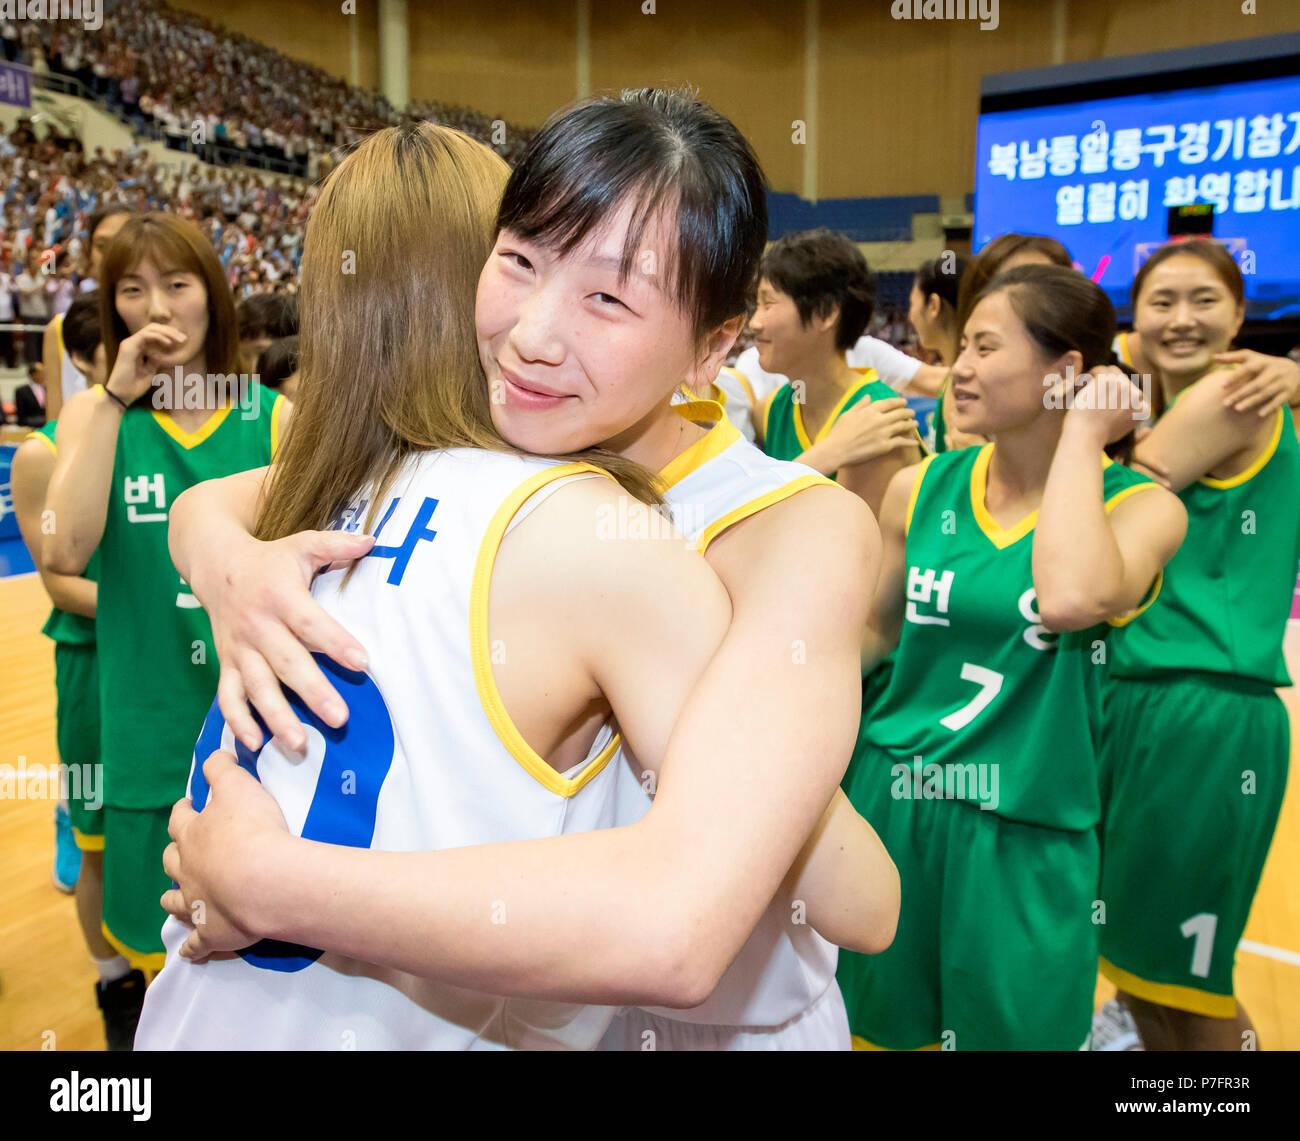 Inter-Korean friendly basketball match, July 5, 2018 : South